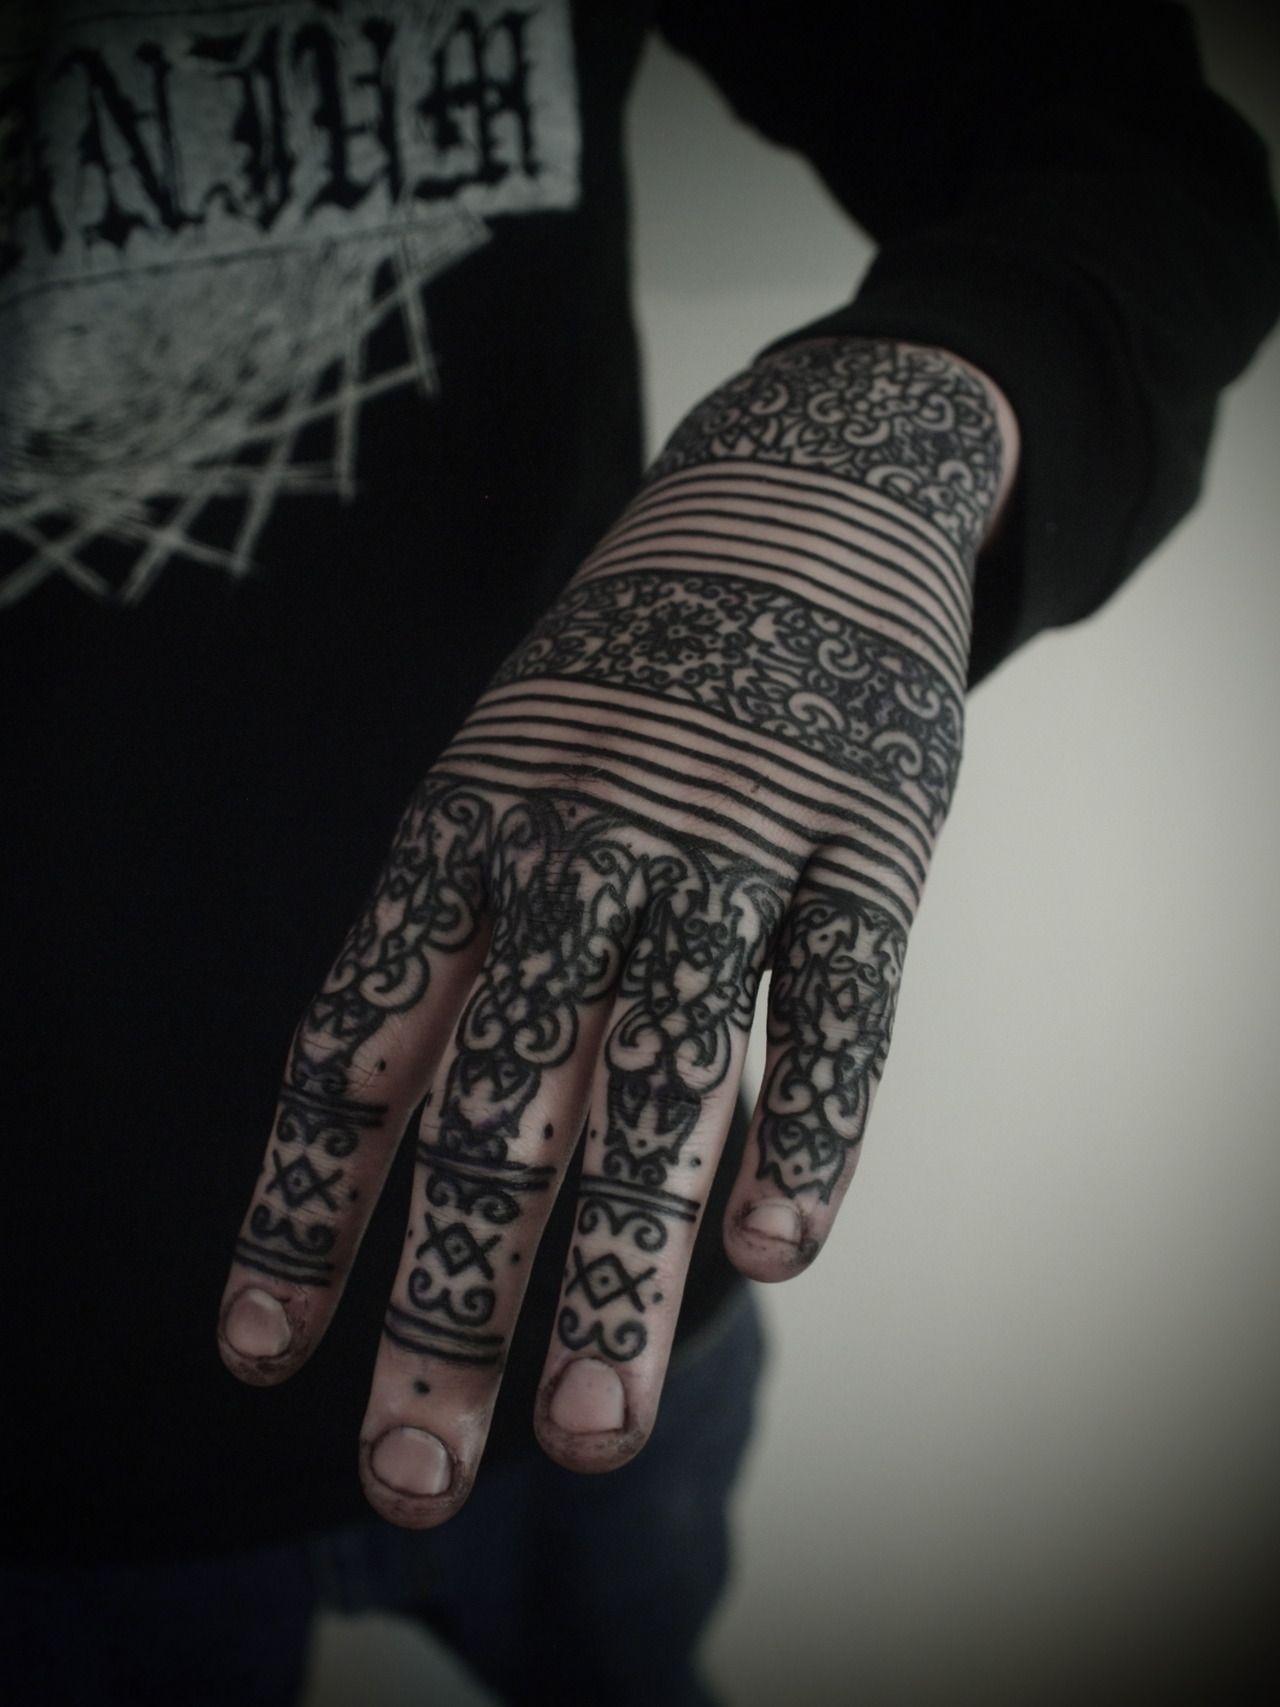 Hands Black Tattoo Henna Designs: Black And White Hot